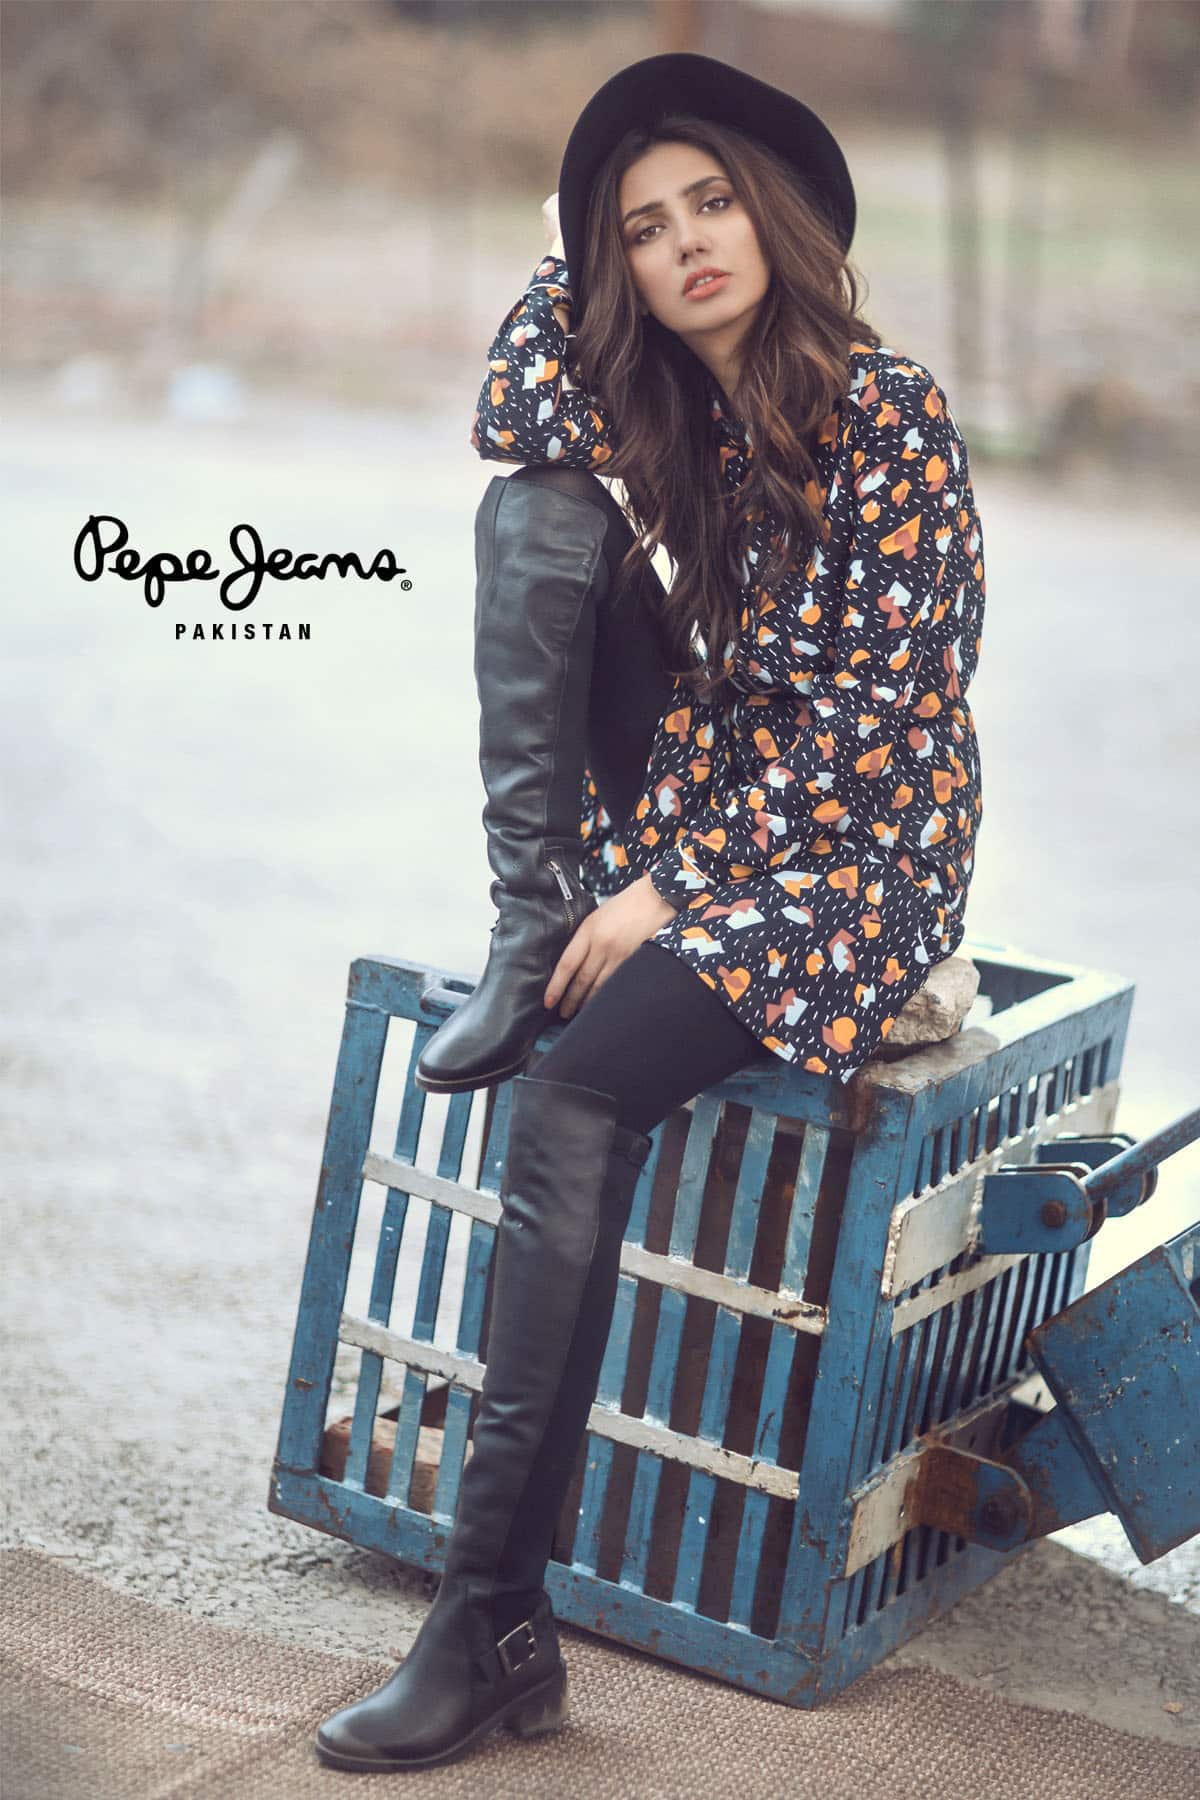 Mahira Khan for Pepe Jeans Pakistan Winter 2015 Campaign – #MKLovesPepe (5)